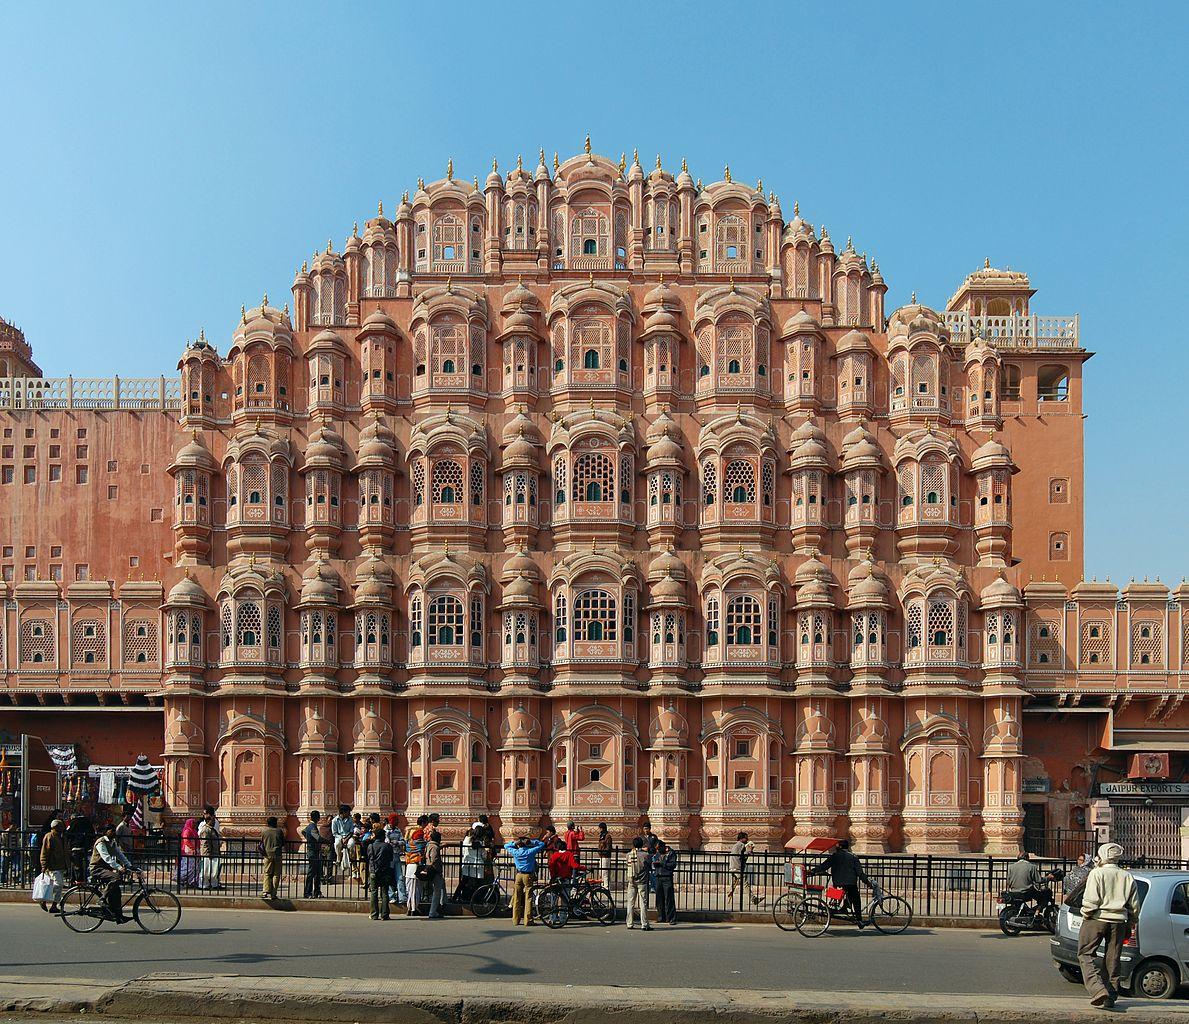 Top-Rated Sight-Seeing Destination in Jaipur-Hawa Mahal